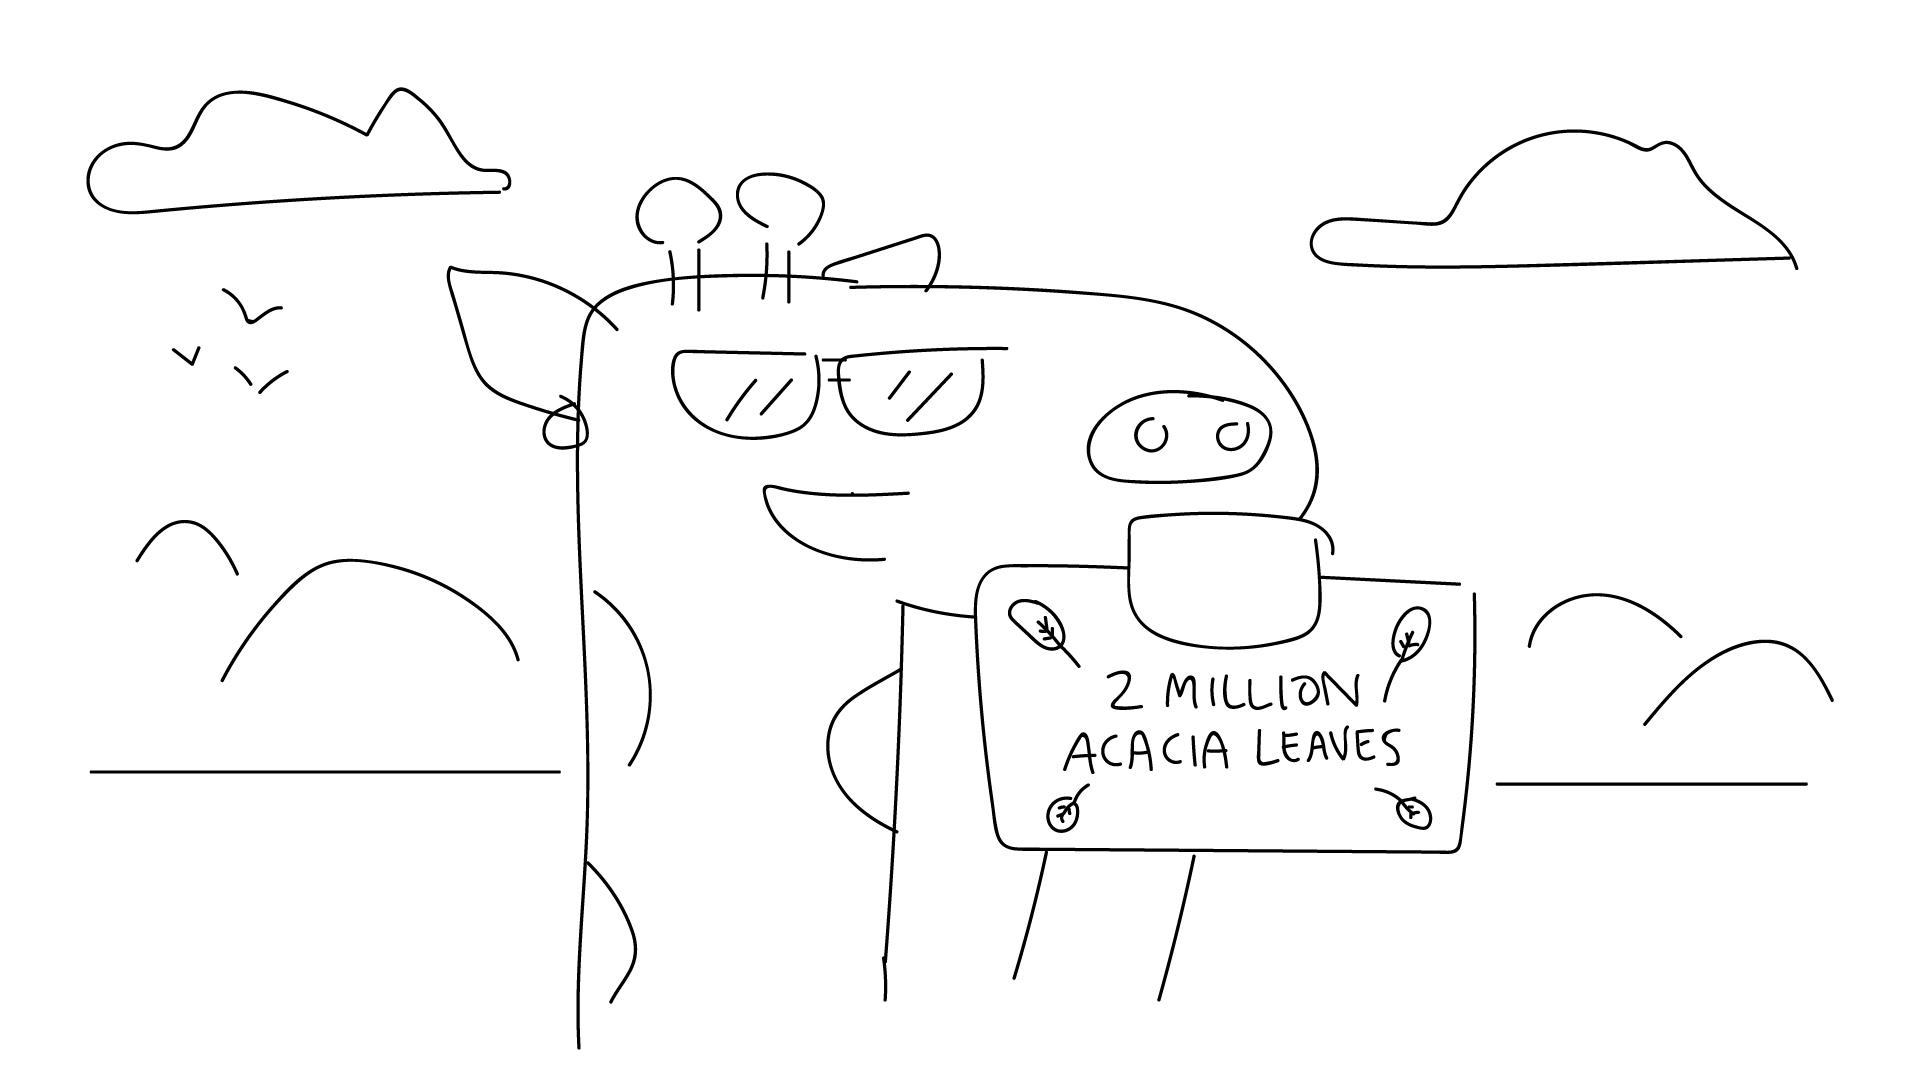 InfluencerArtboard 1 copy 7_Storyboards.jpg